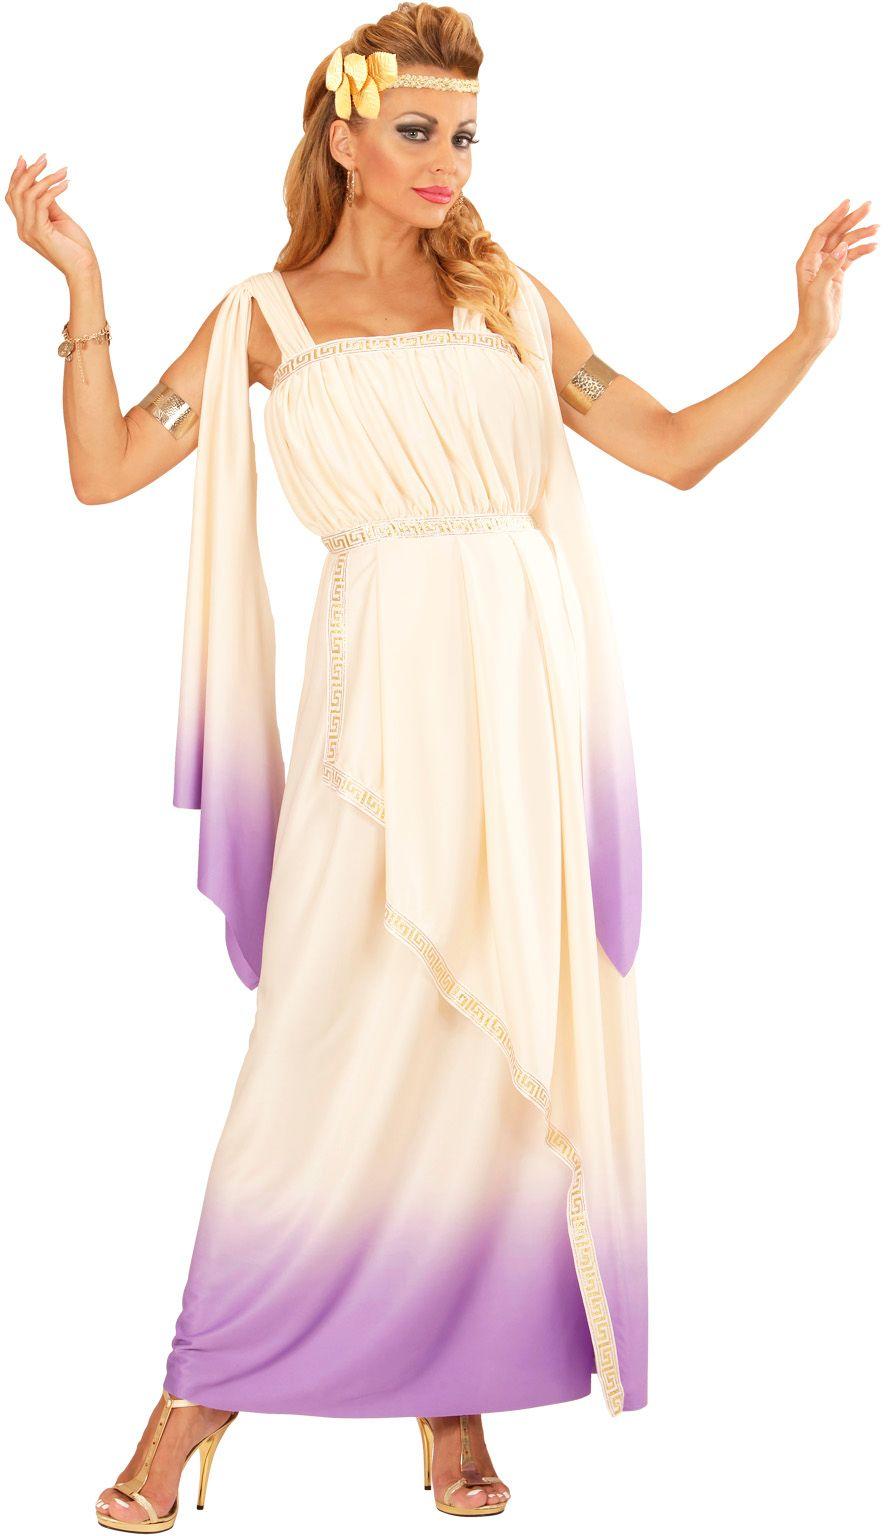 Griekse godin wit/paars